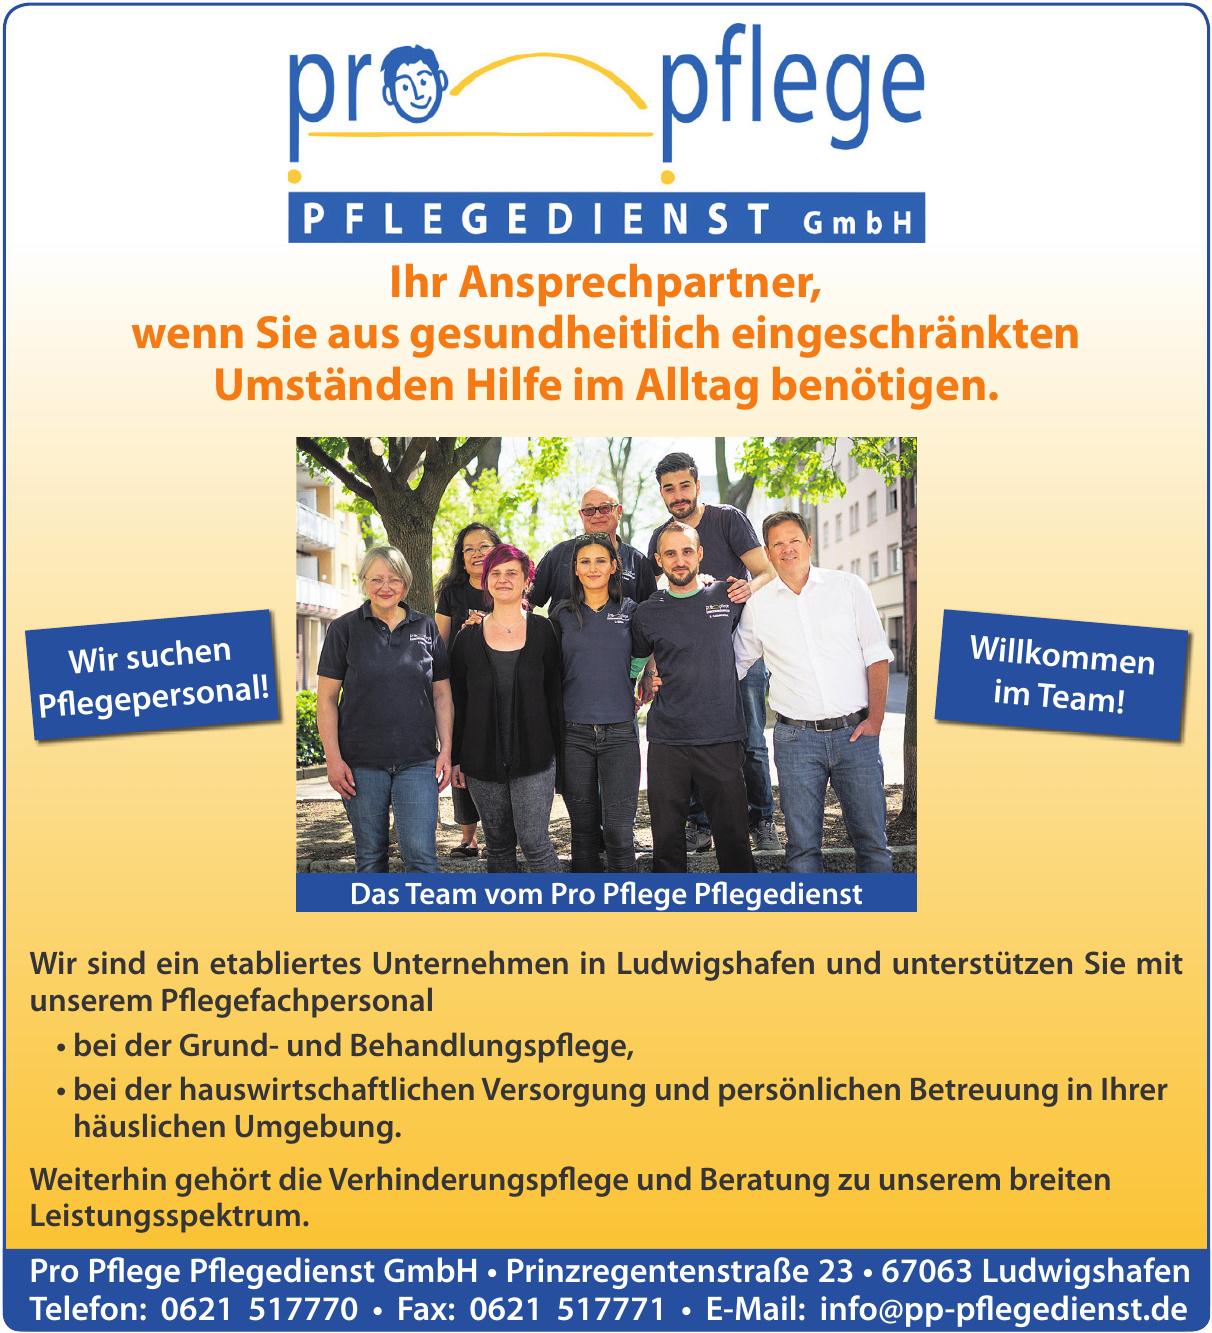 Pro Pflege Pflegedienst GmbH